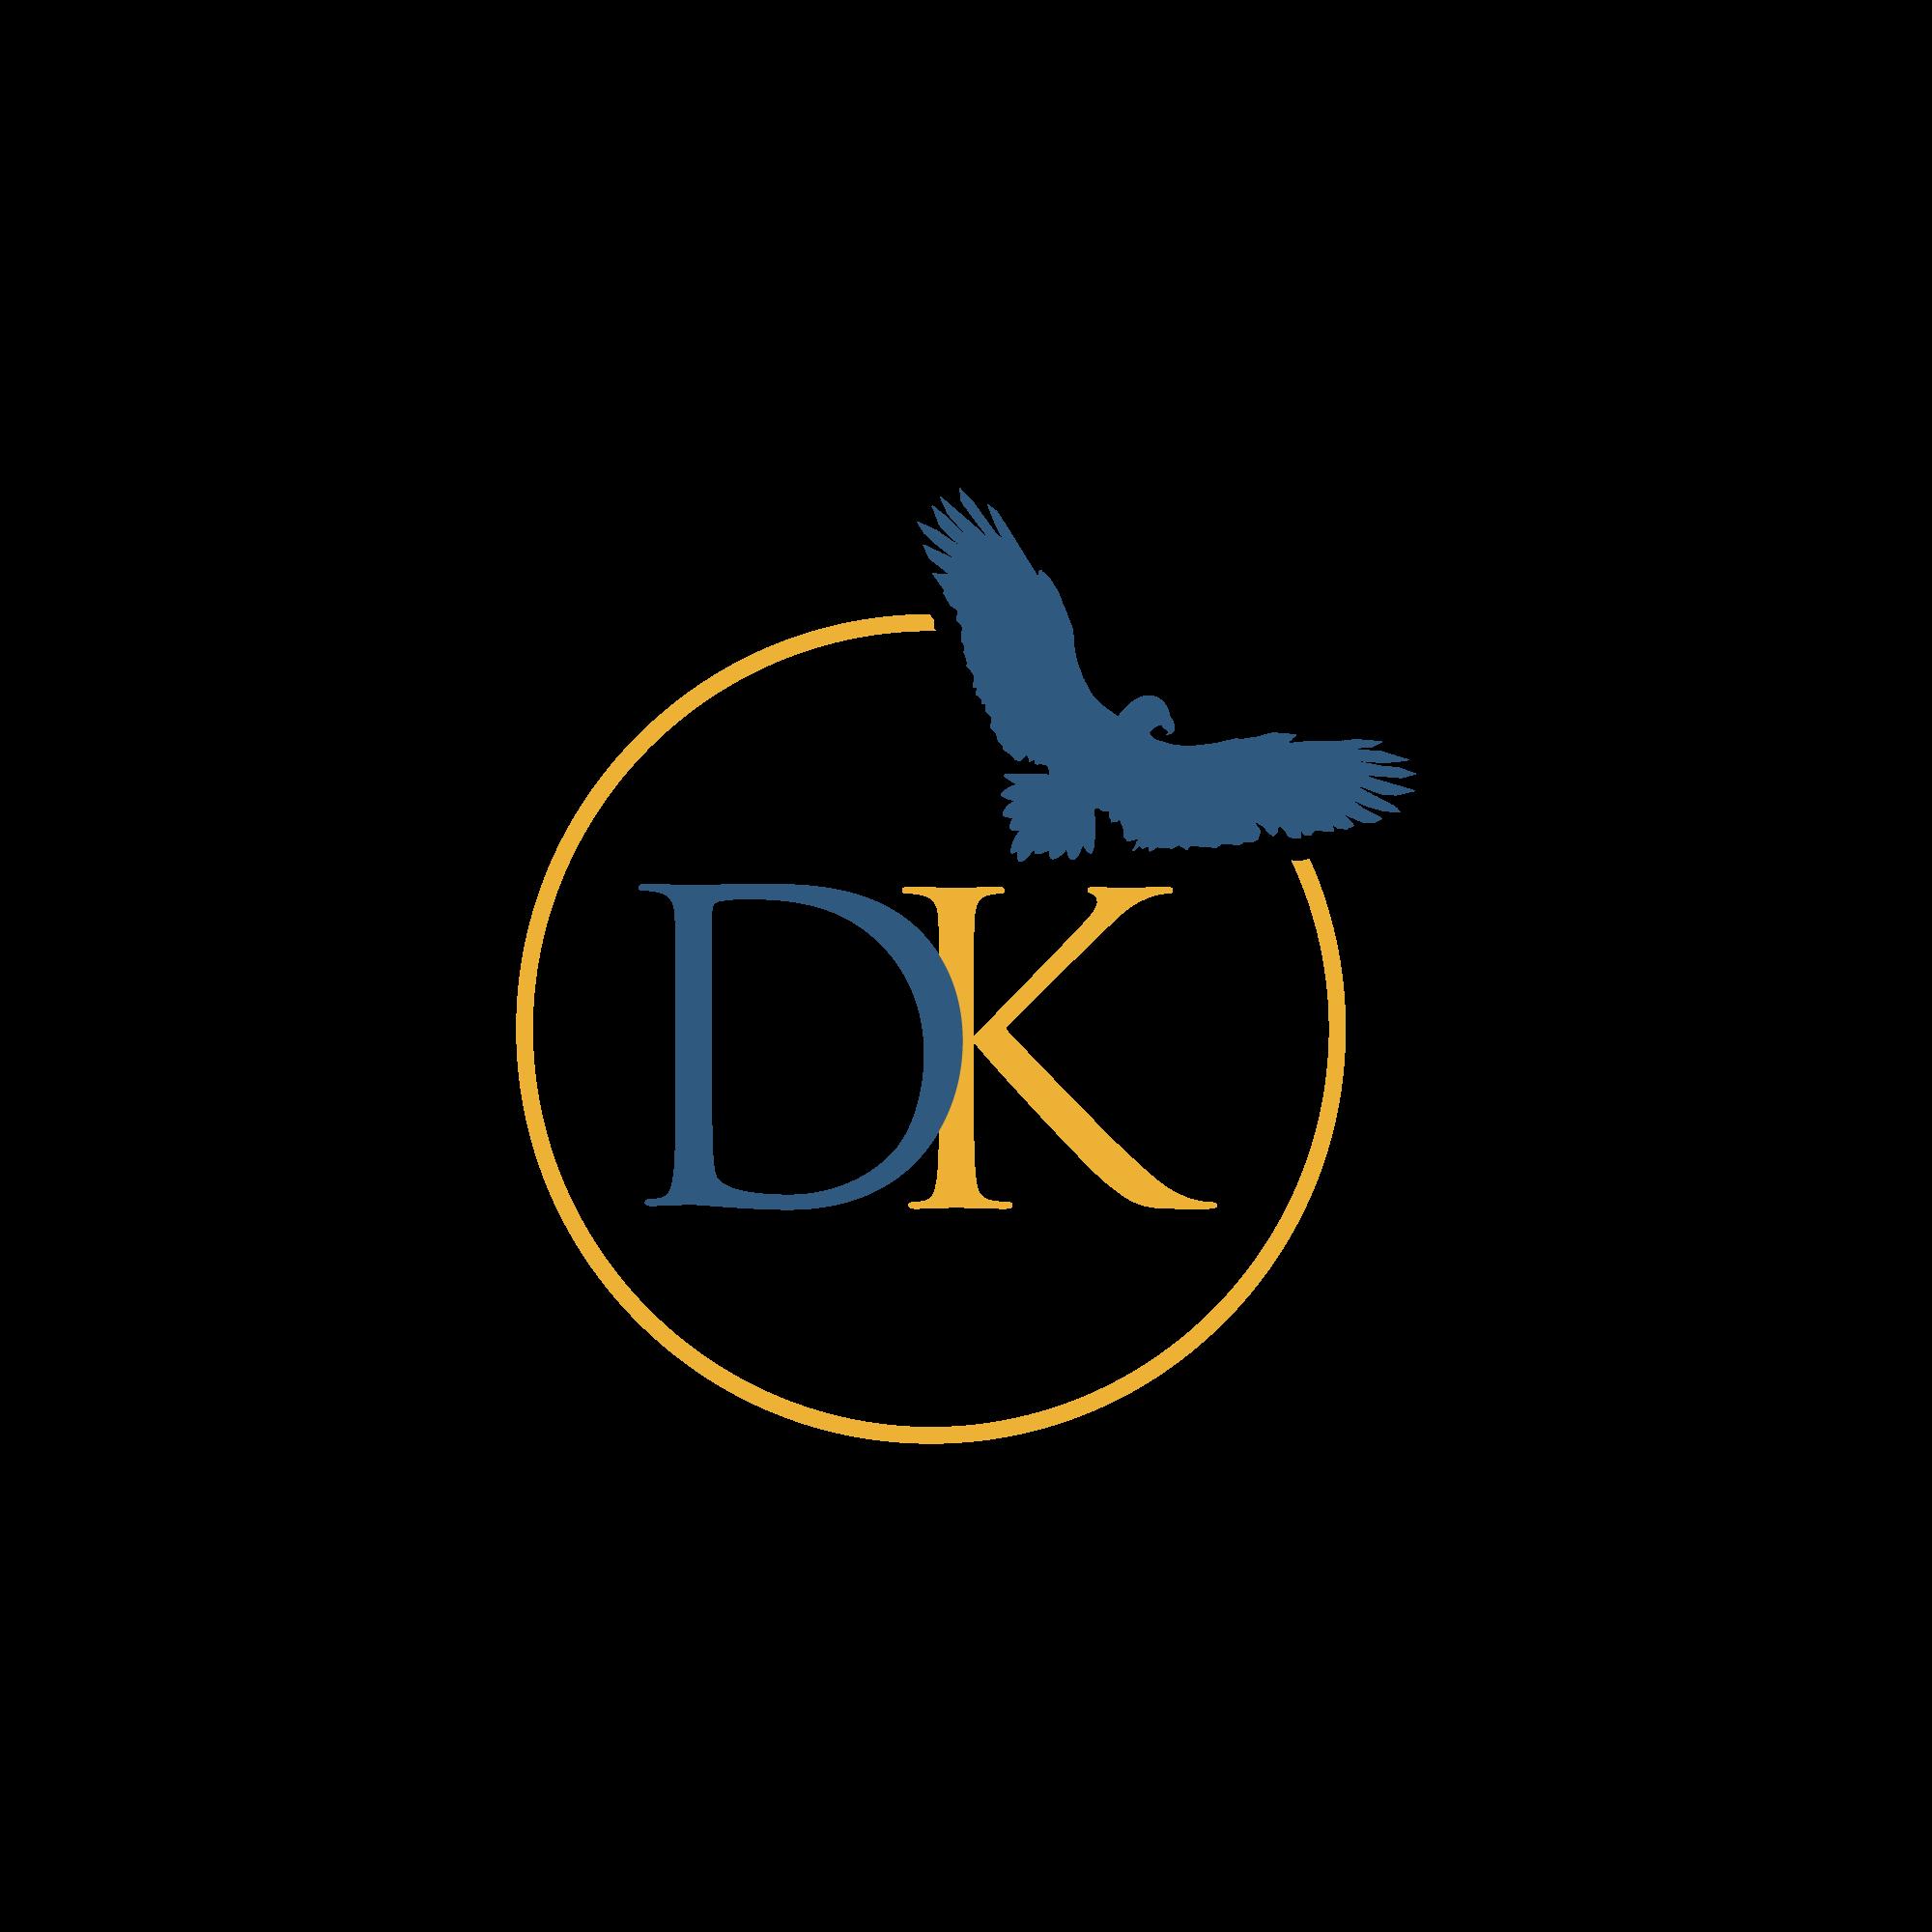 DK School of Hypnosis